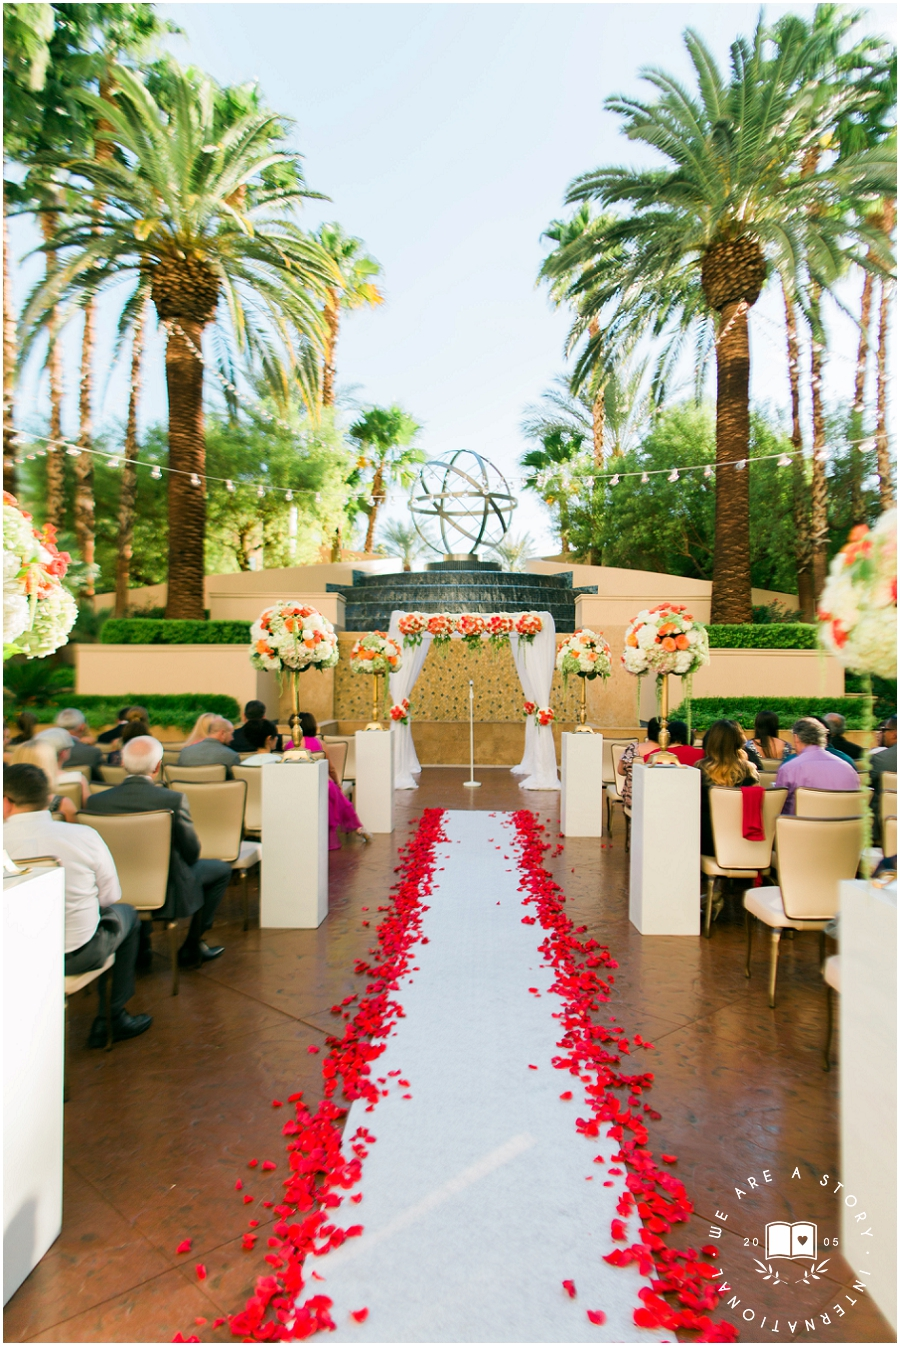 Four Seasons wedding photographer Las Vegas _ We Are A Story wedding photographer_2485.jpg